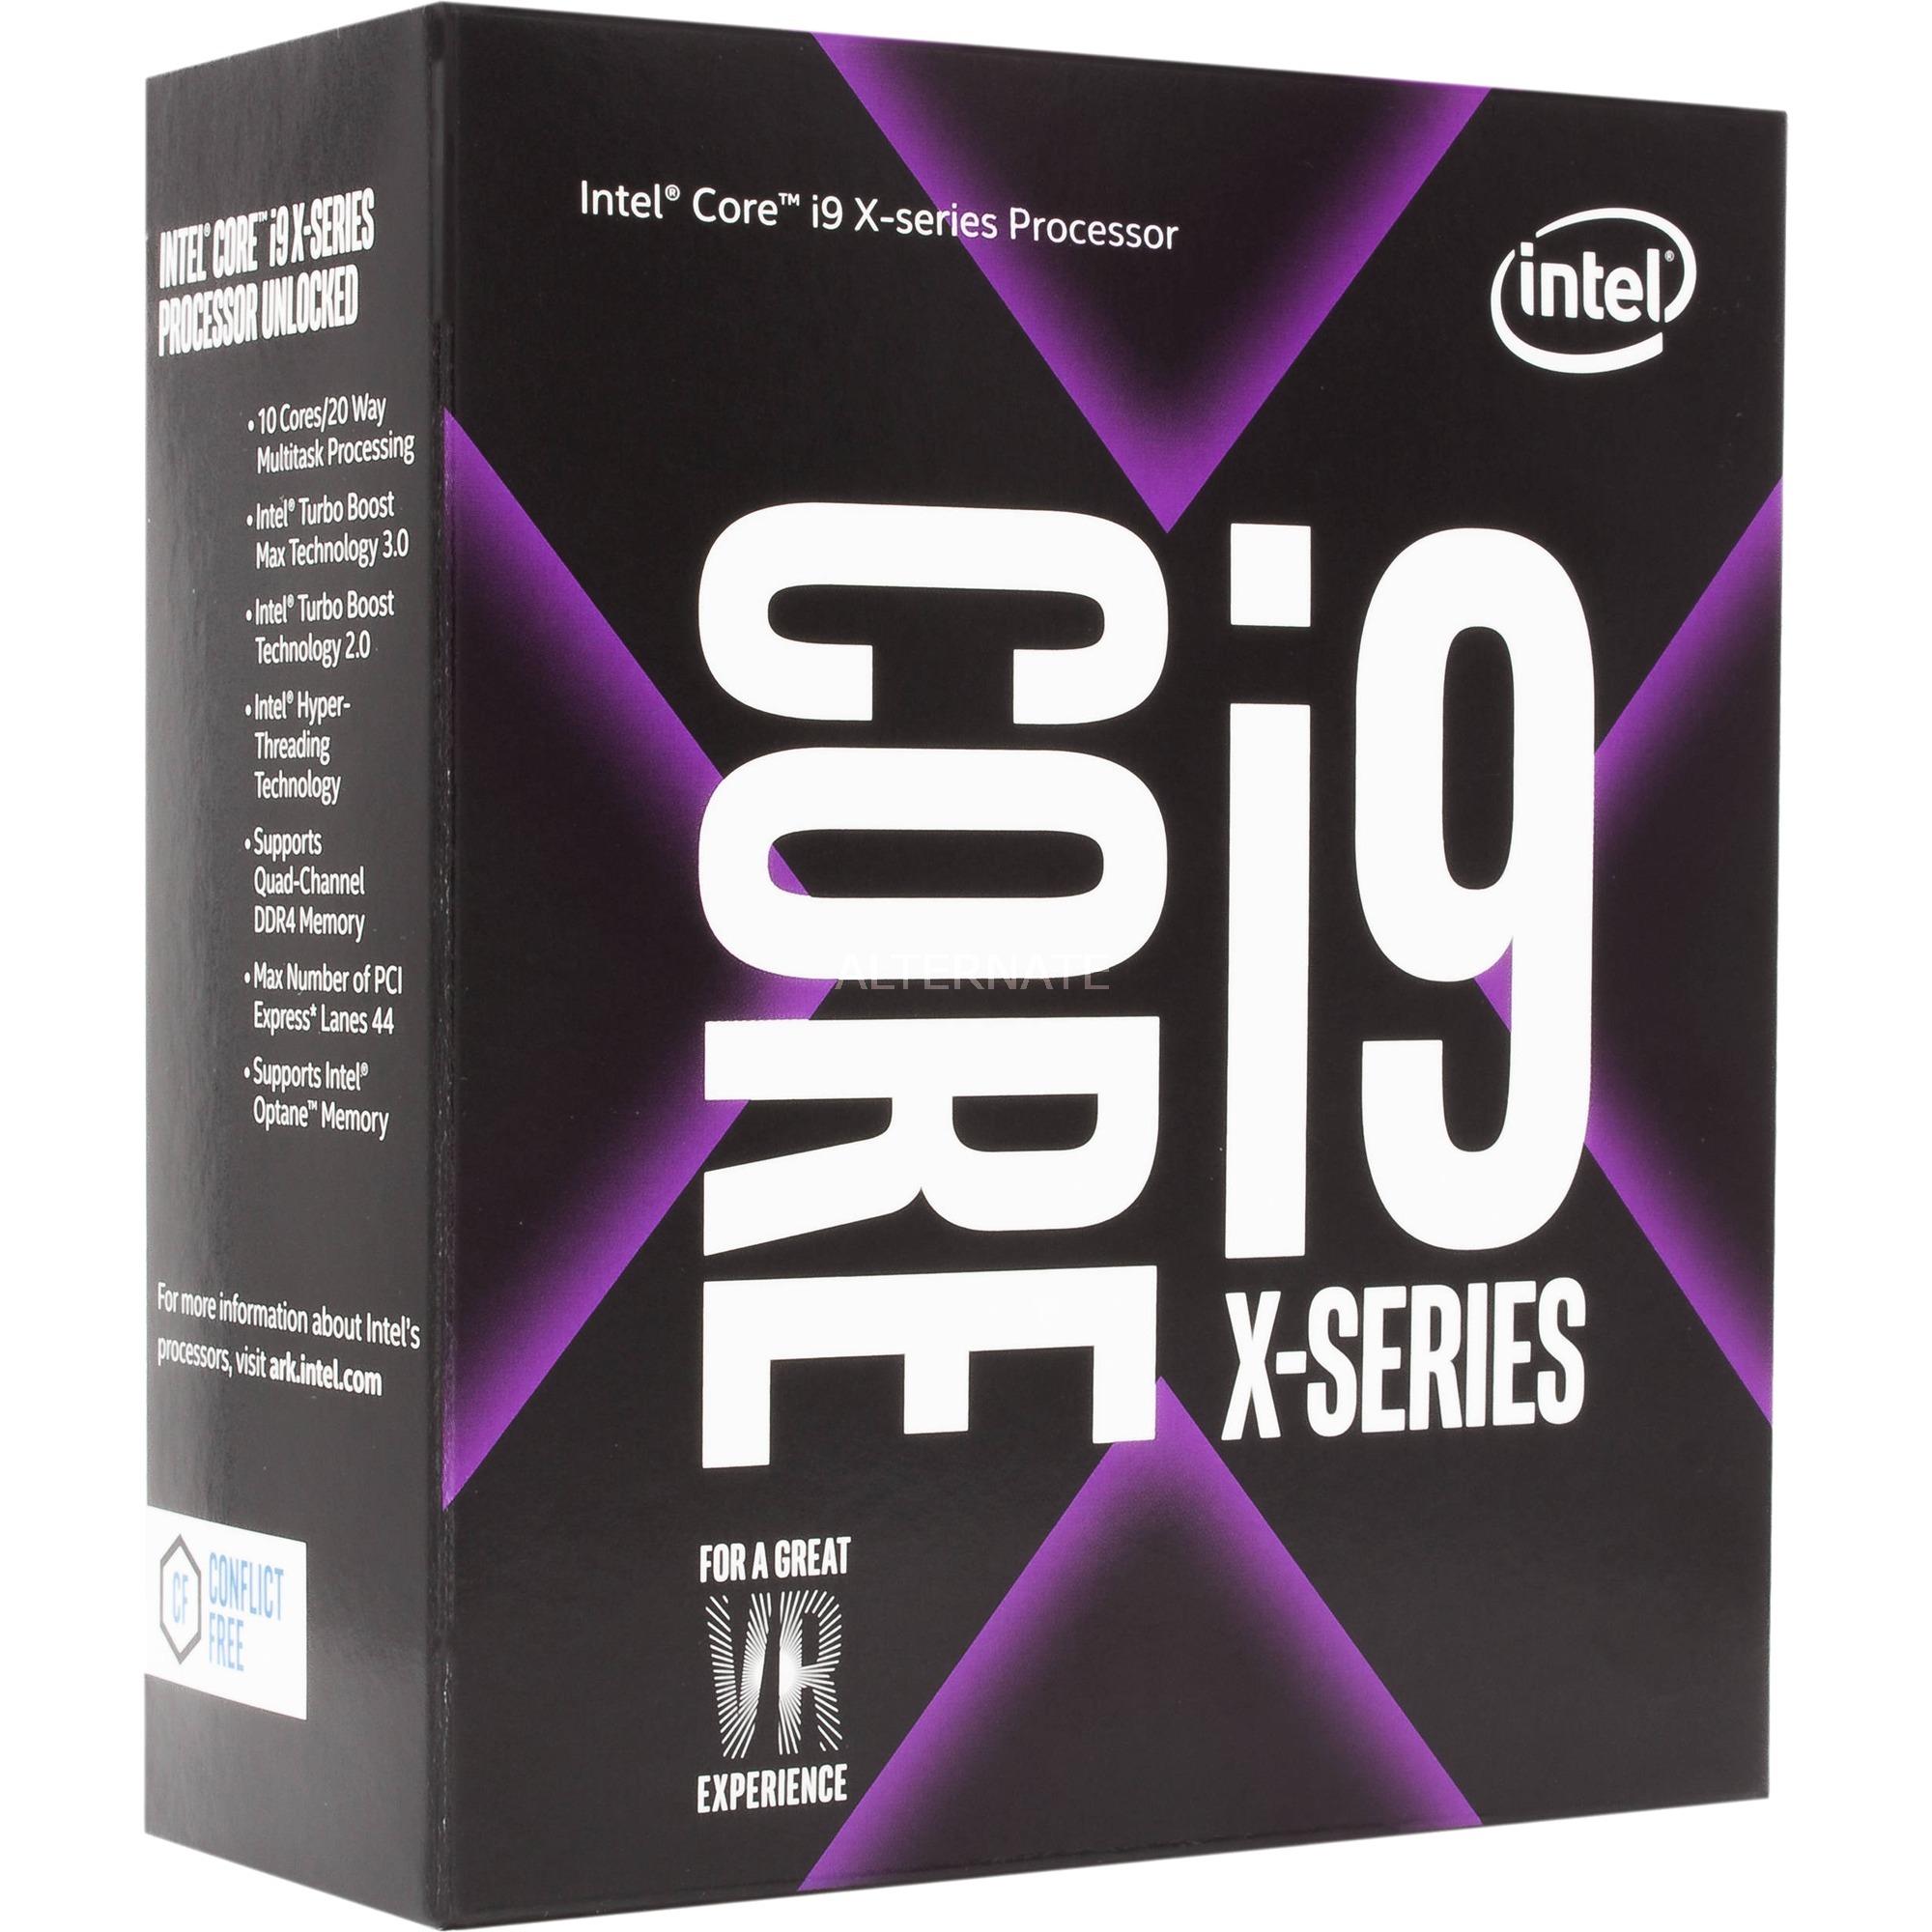 Core i9-7920X X-series Processor (16.50M Cache, up to 4.30 GHz) 2.9GHz 16.5MB L3 Caja procesador